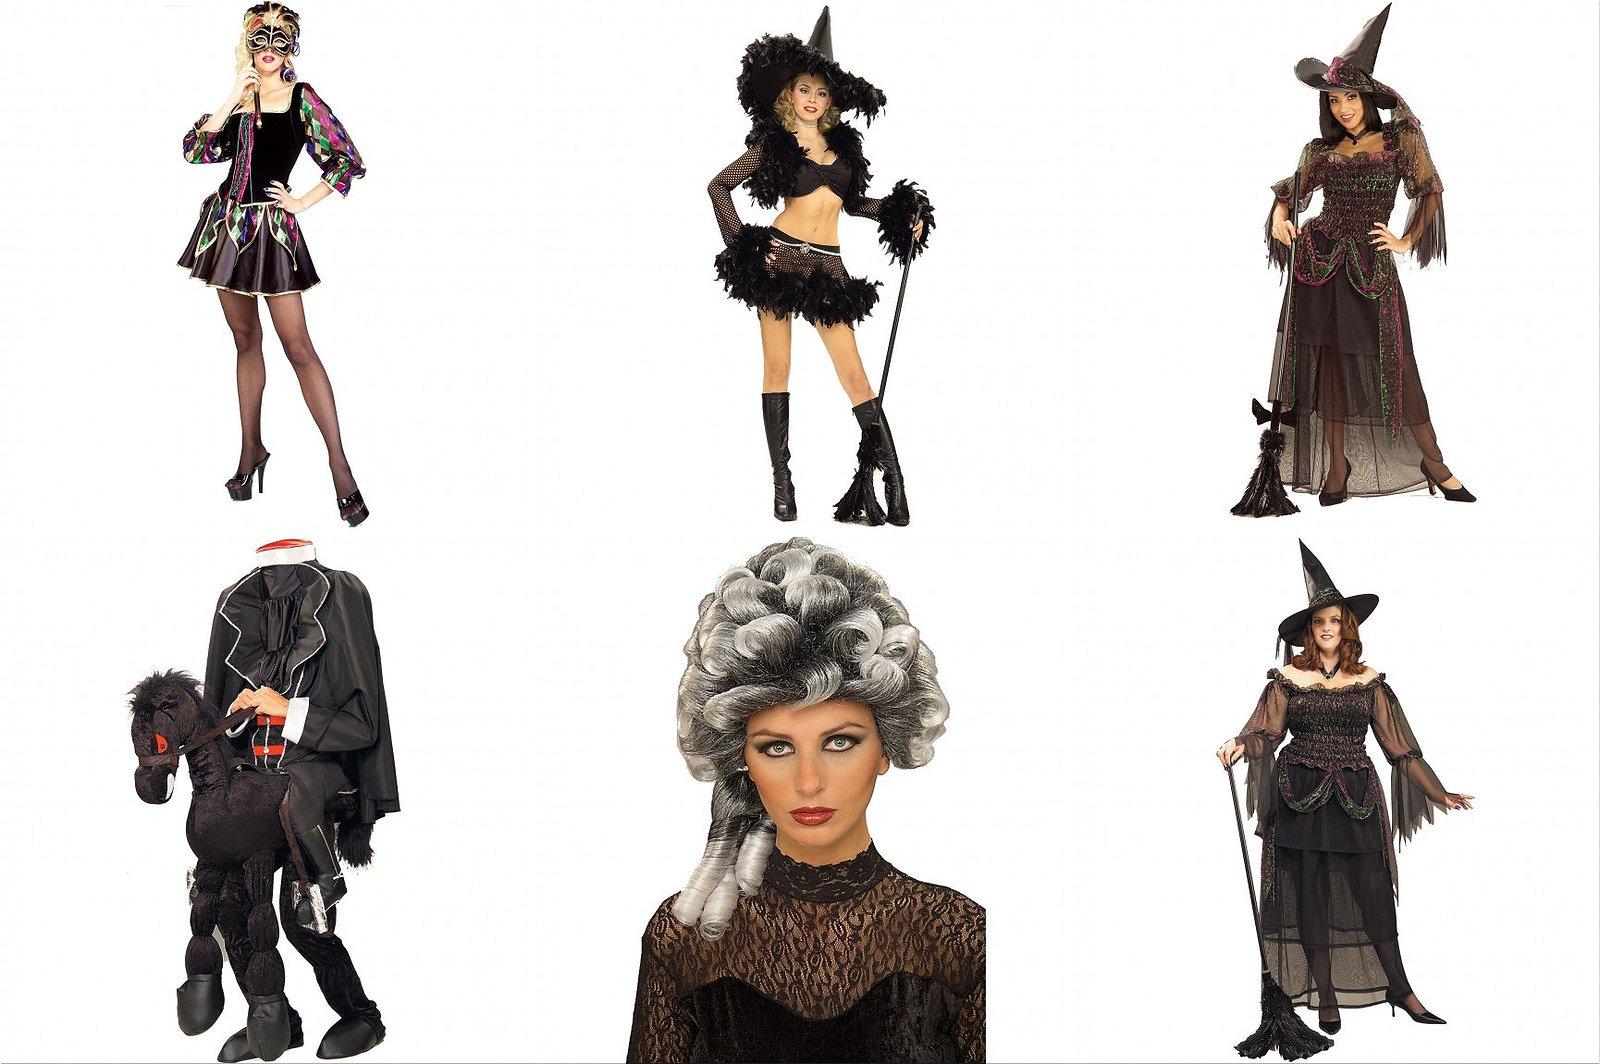 Halloween costumes for men and women